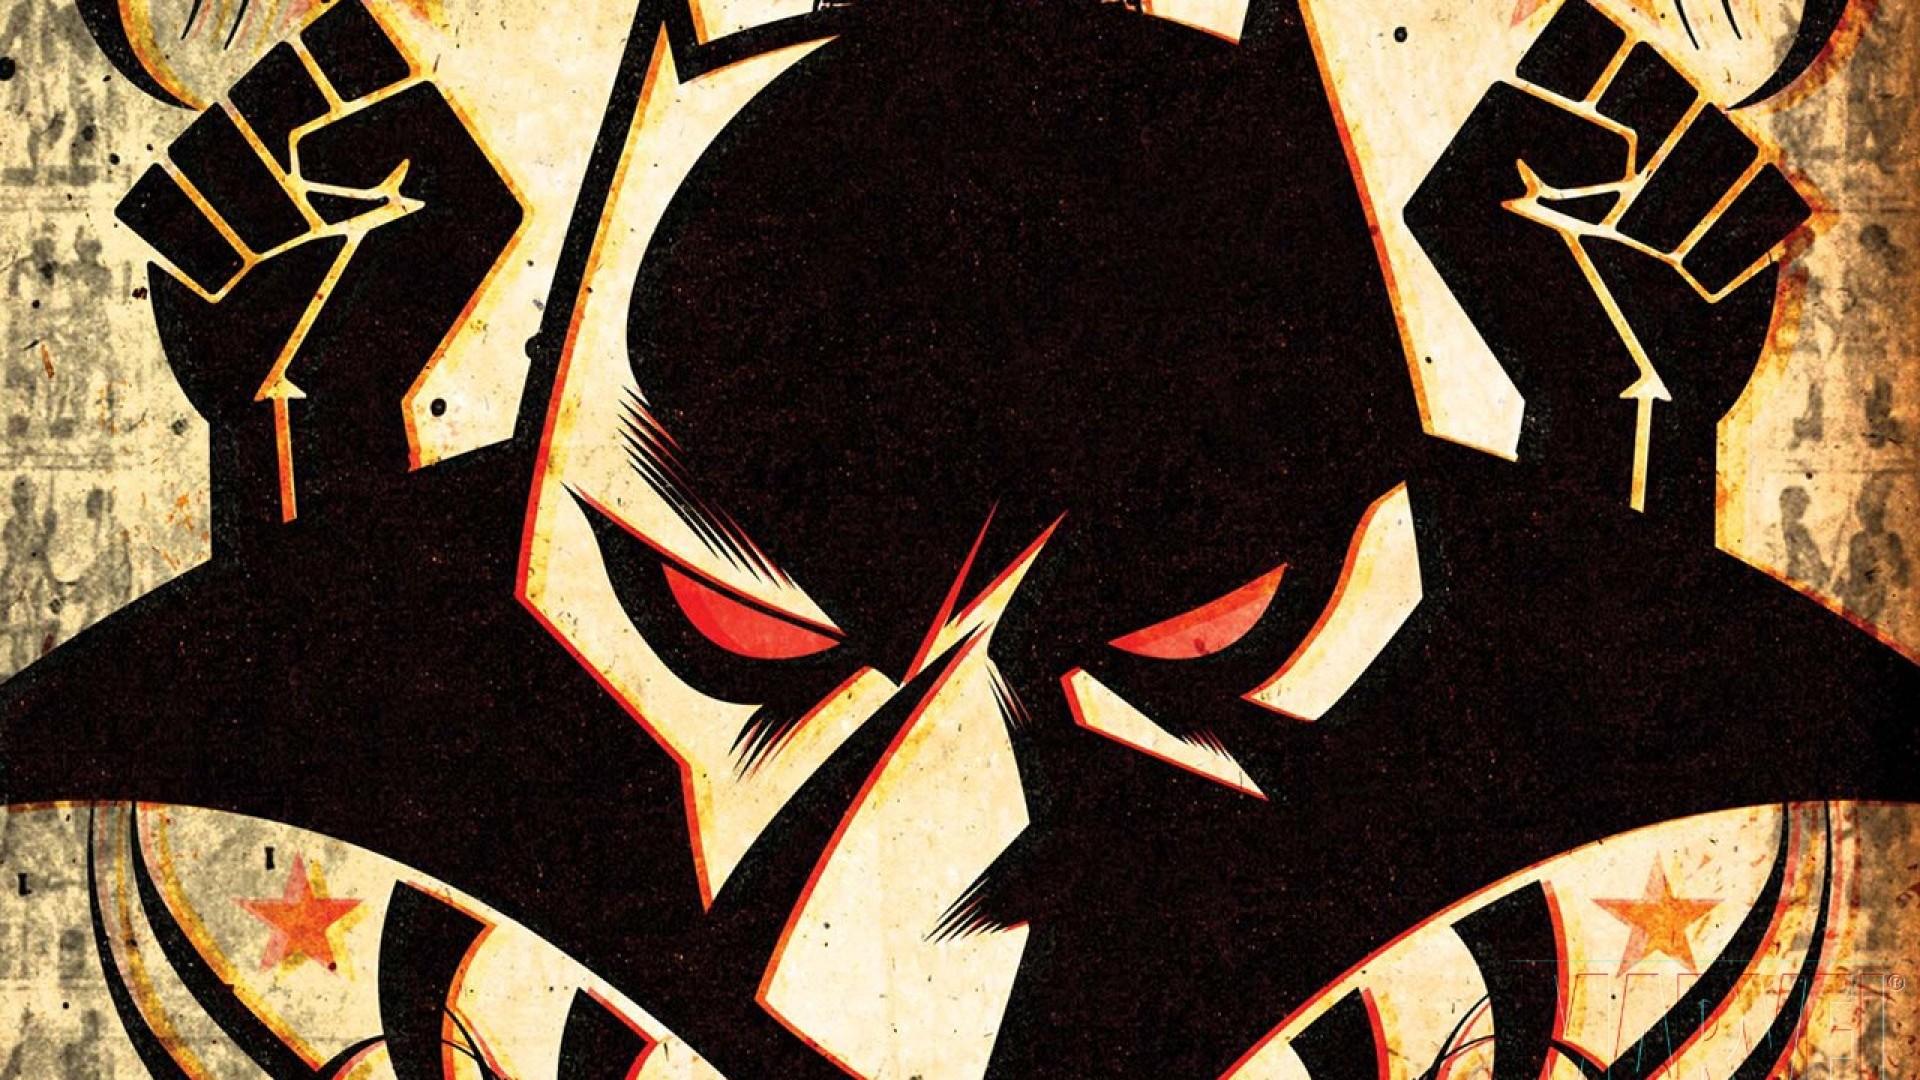 Pantera Imagenes Para Fondo De Pantalla Hd: Black Panther Full HD Wallpaper And Background Image